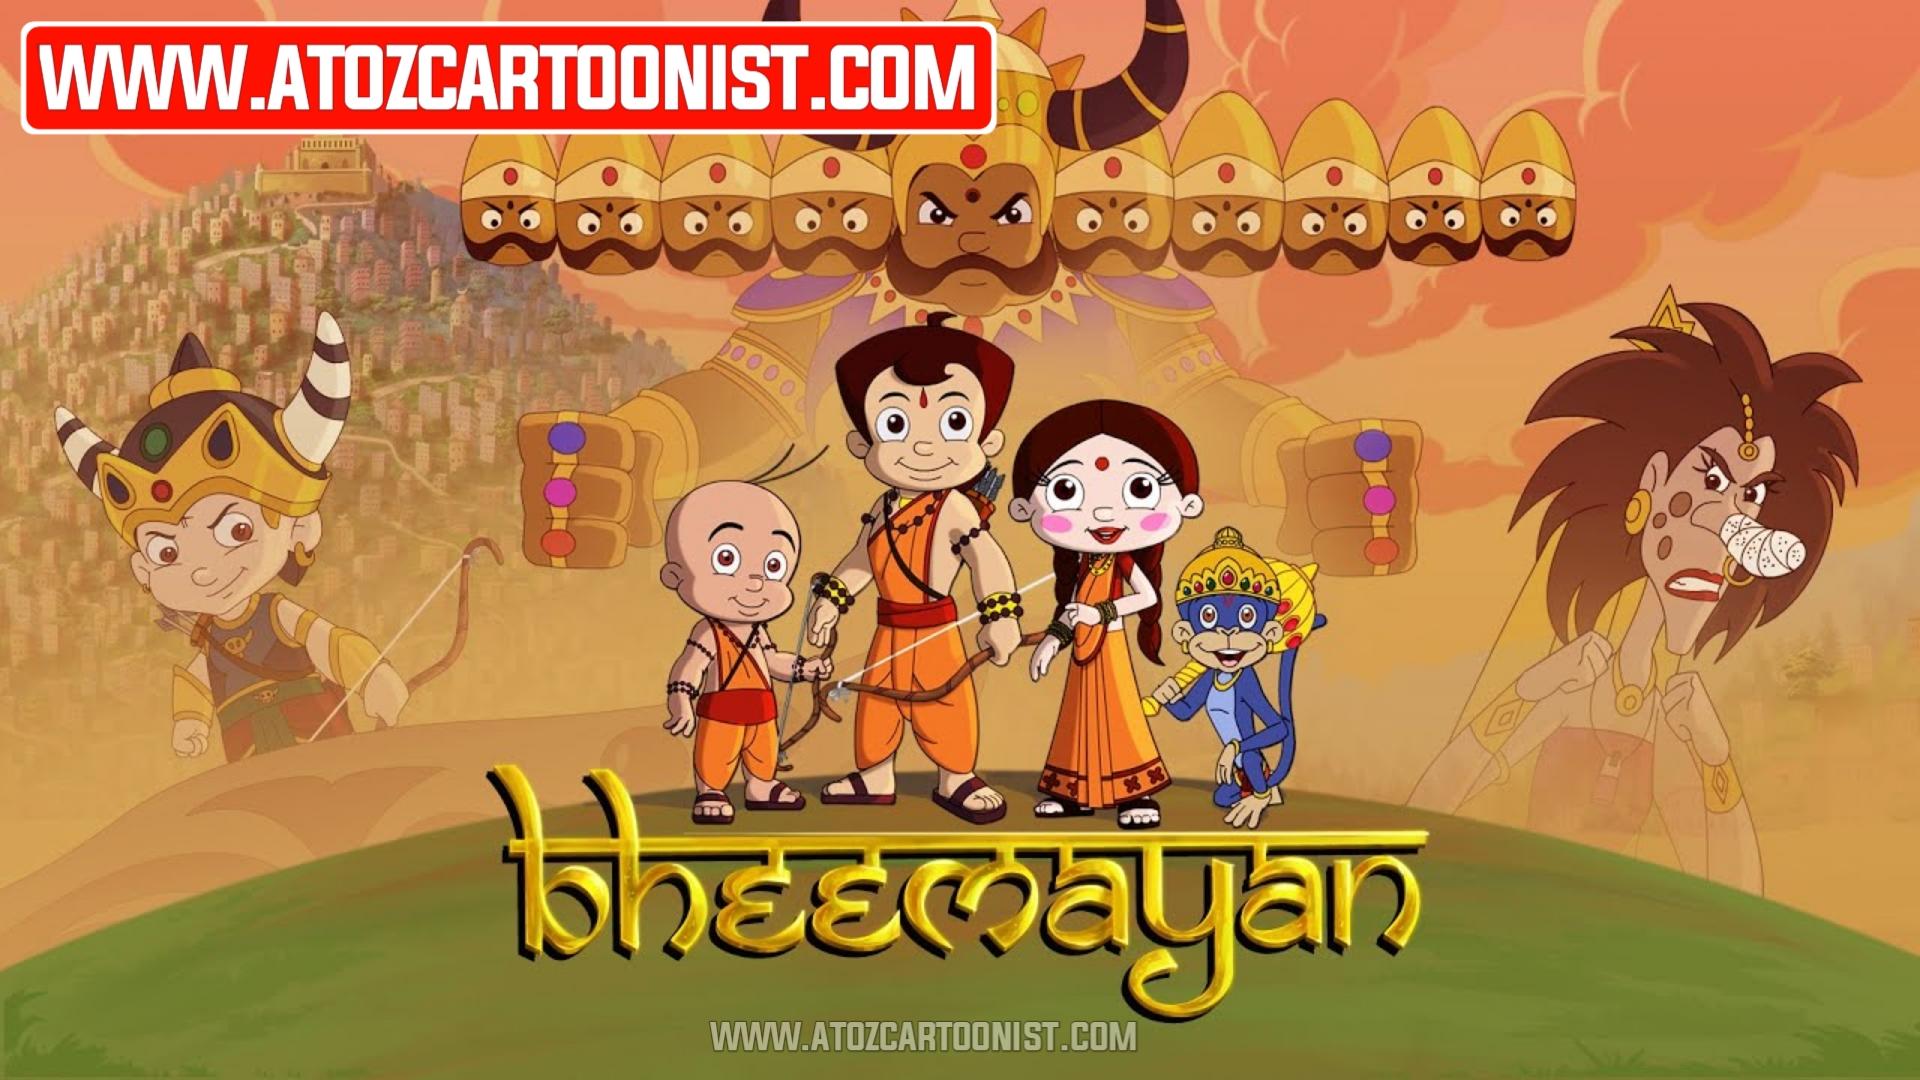 BHEEMAYAN – CHHOTA BHEEM FULL MOVIE IN HINDI – TAMIL – TELUGU DOWNLOAD (480P, 720P & 1080P)